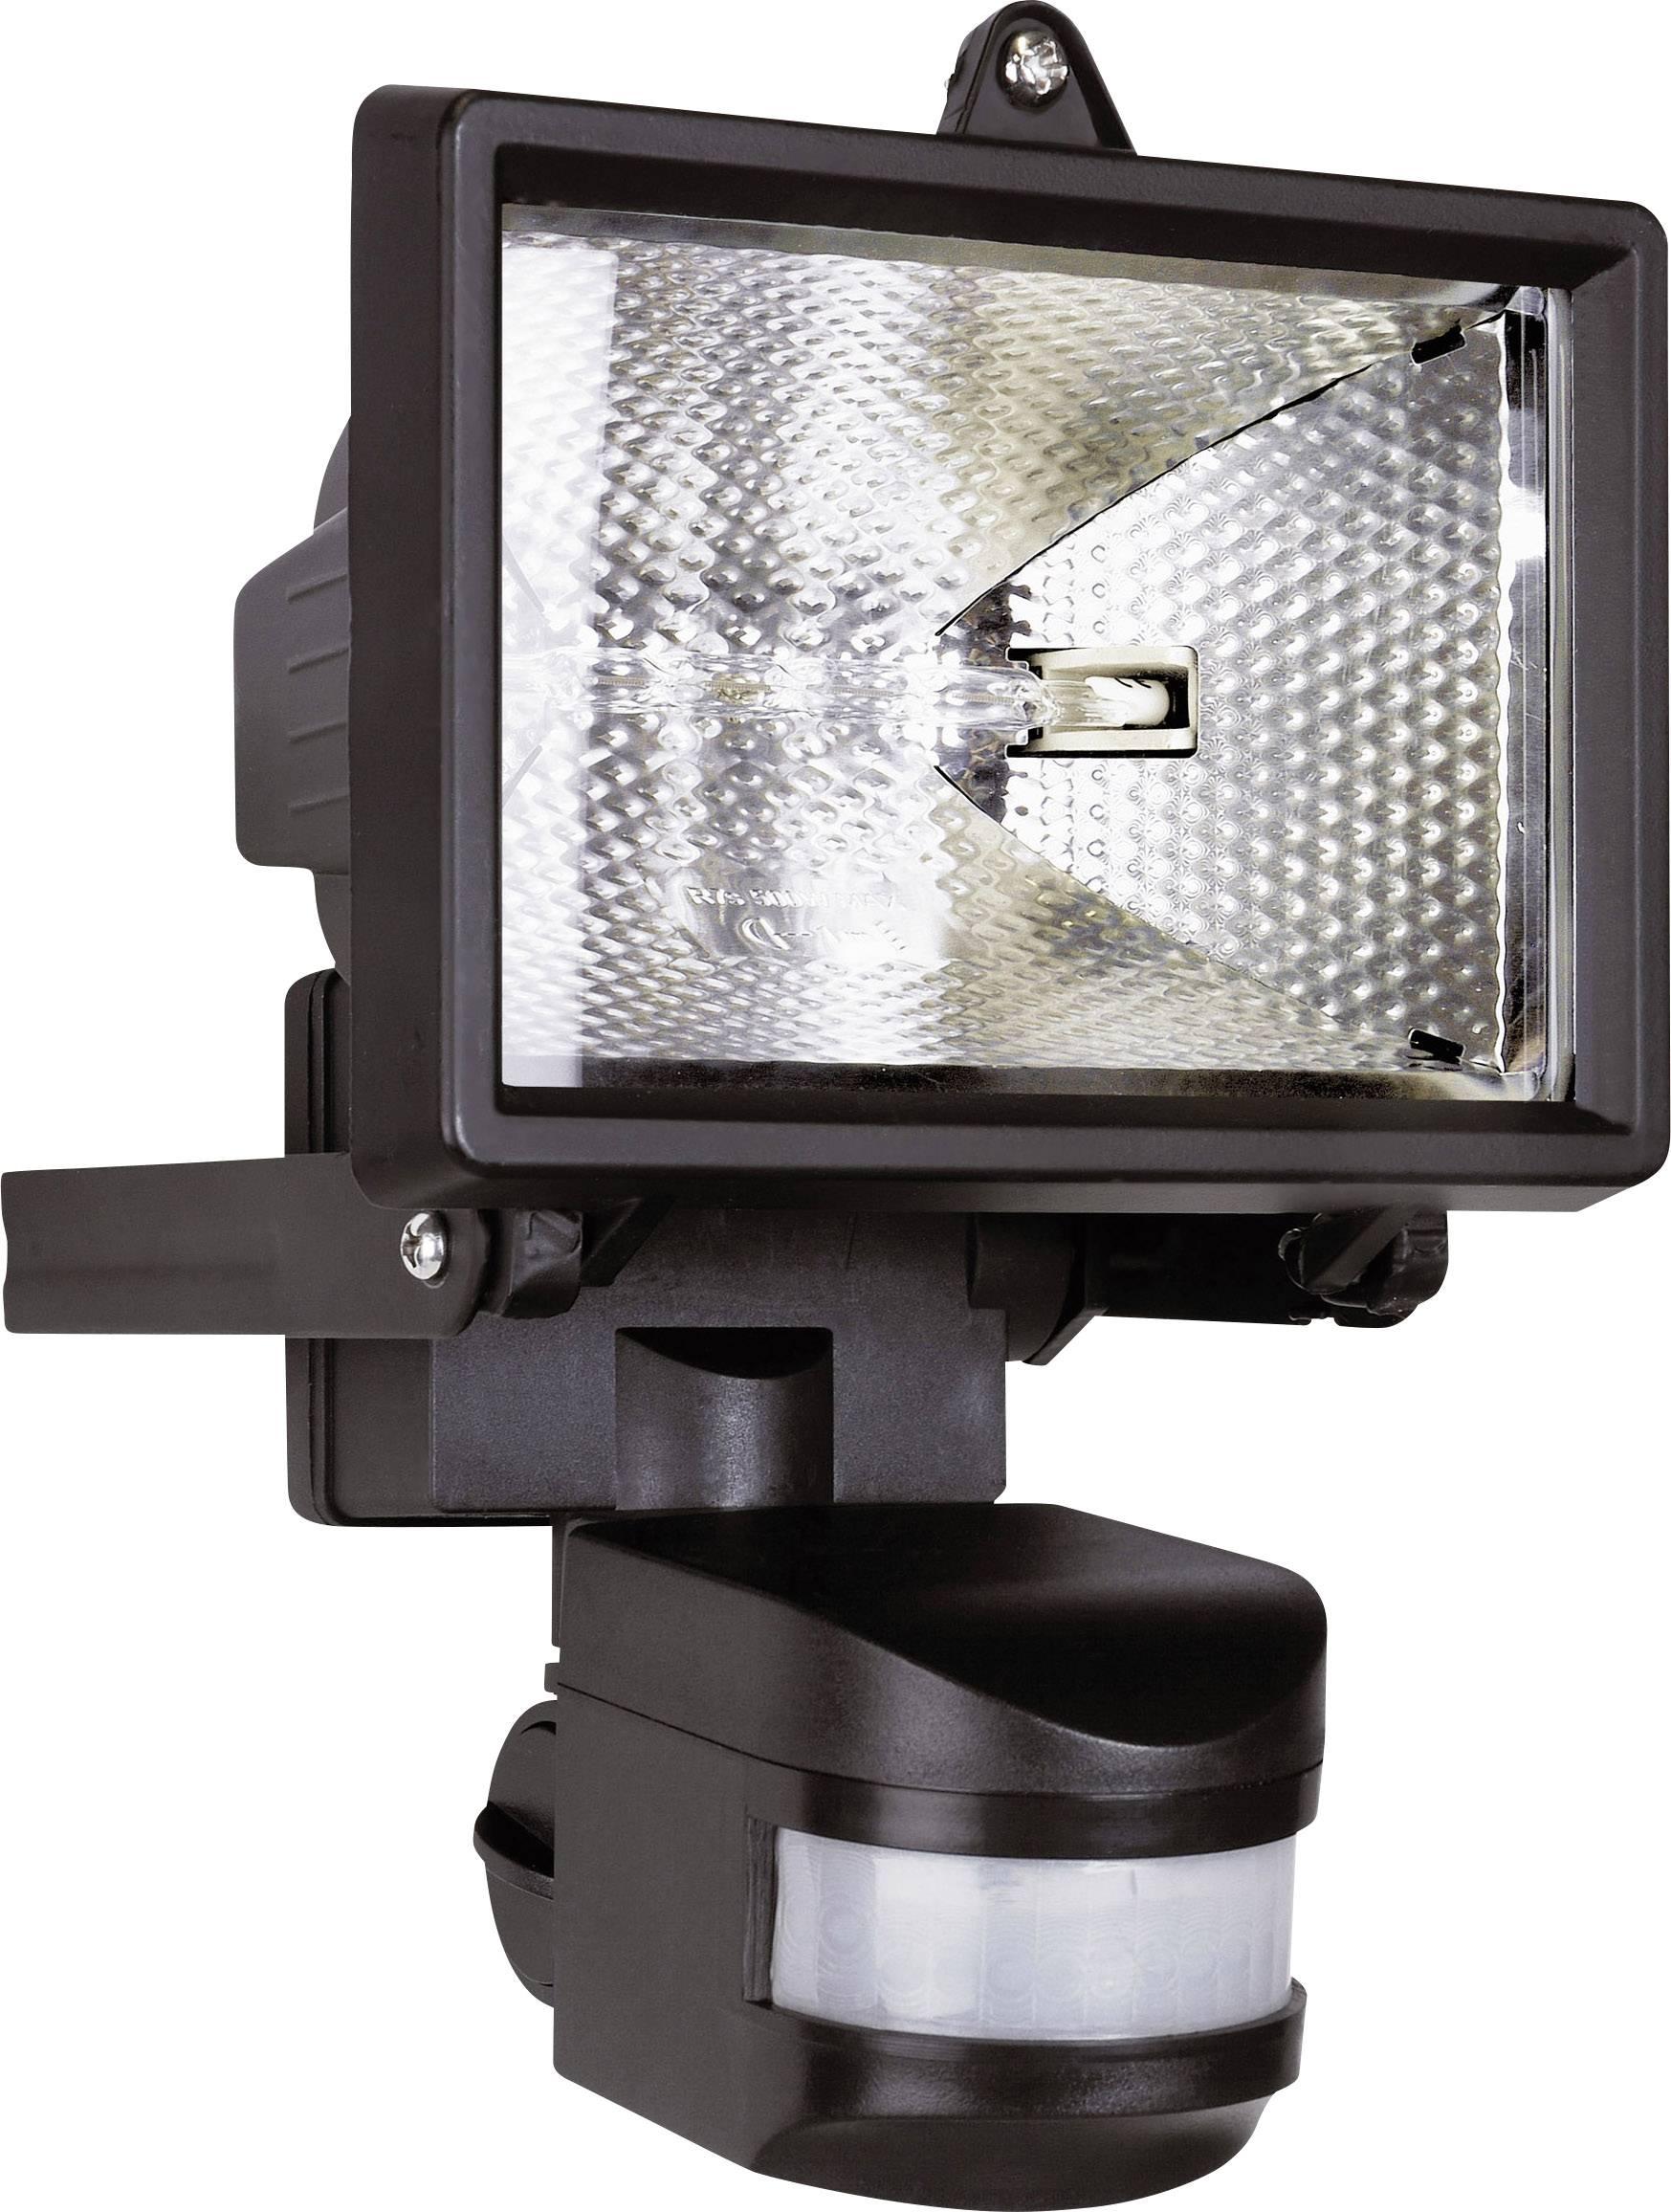 Halogenový reflektor s detektorem pohybu Smartwares ES120, 120 W, IP44, černá